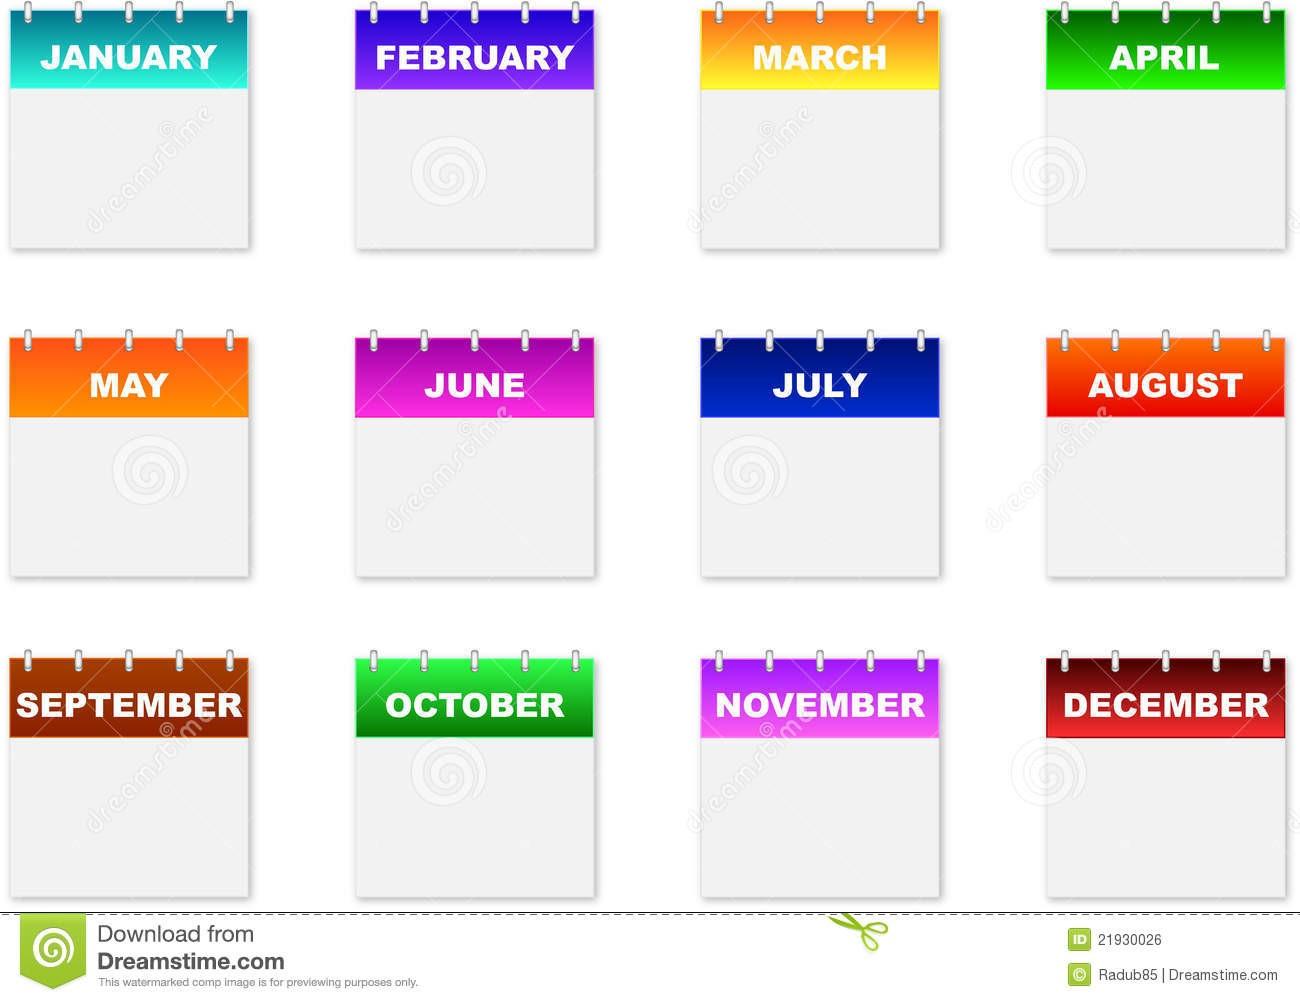 6 month calendar template  Calendar Icons Royalty Free Stock Image - Image: 21930026 - 6 month calendar template